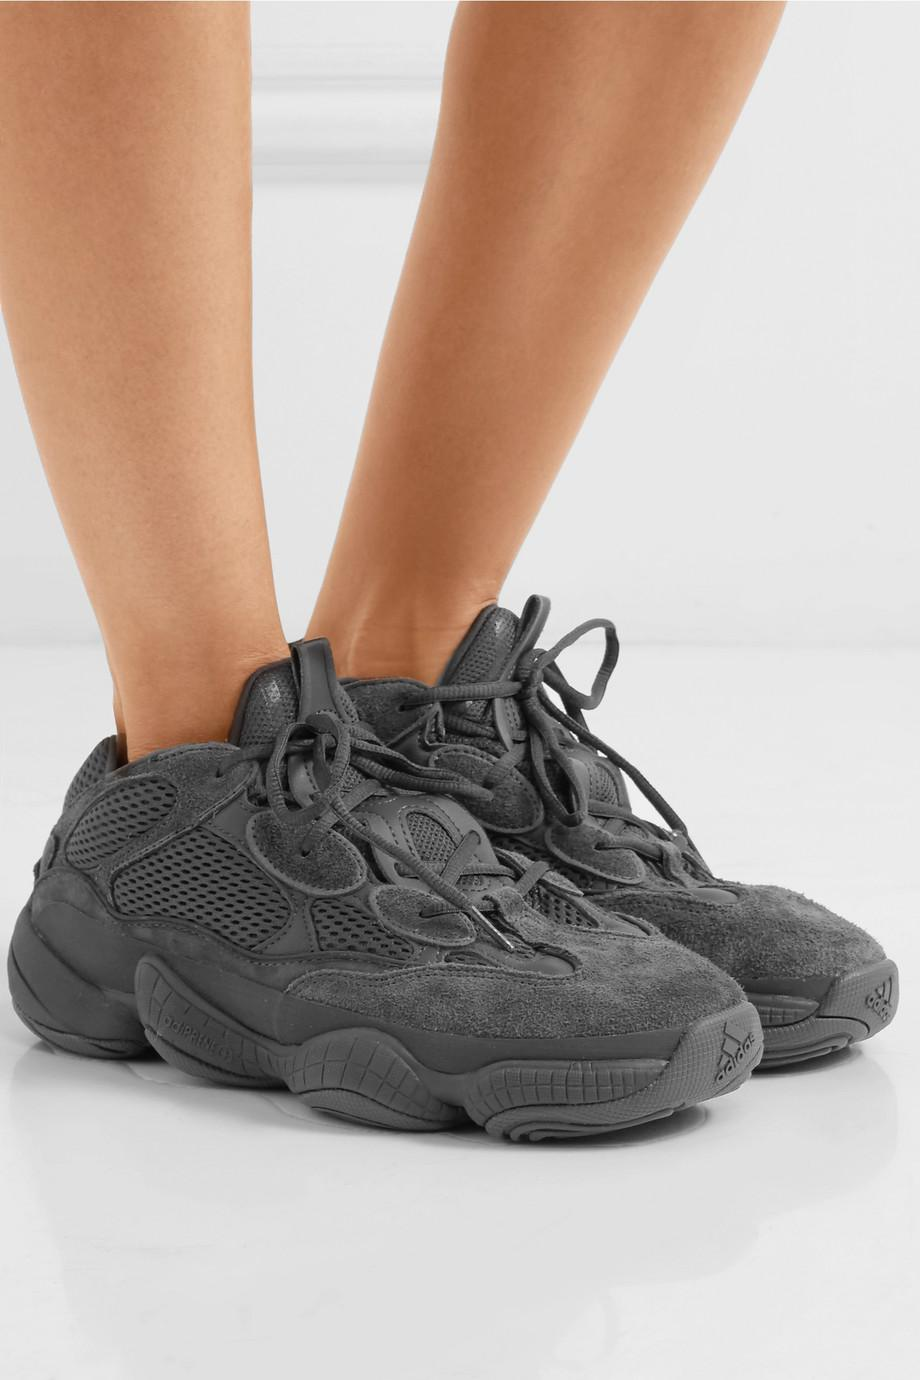 ec5ccb684 Lyst - adidas Originals Kanye West Yeezy 500 Desert Rat Suede And ...